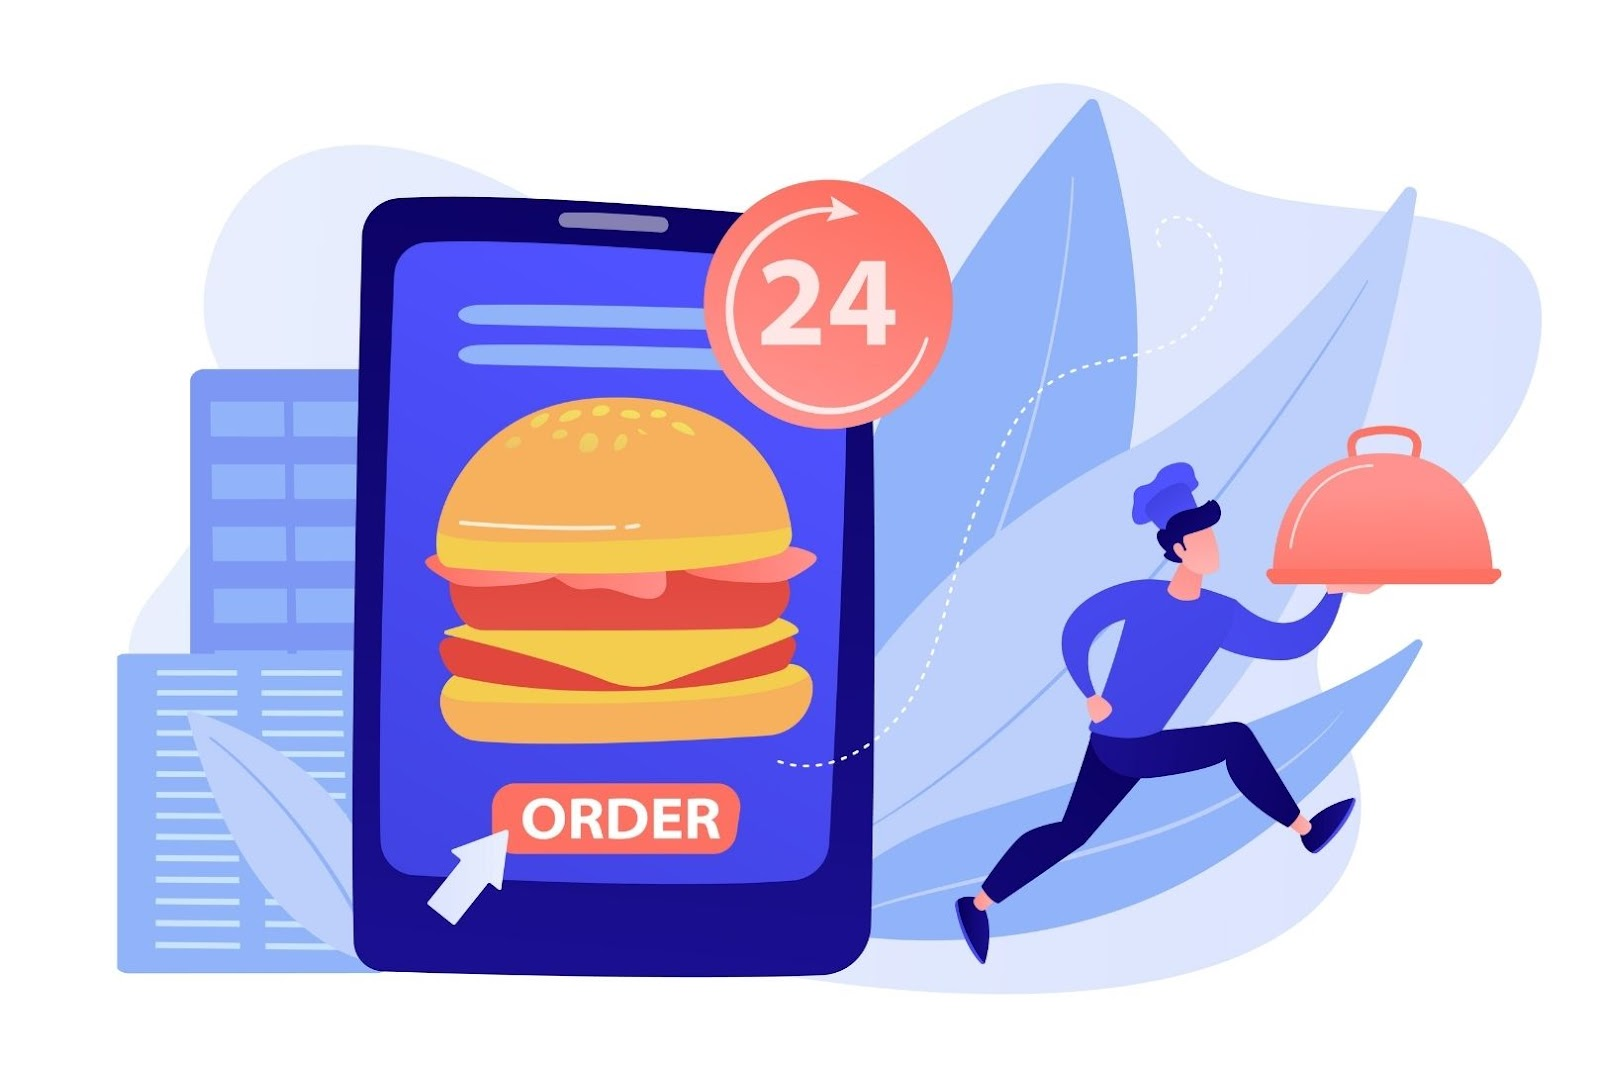 On-demand food ordering app for restaurants